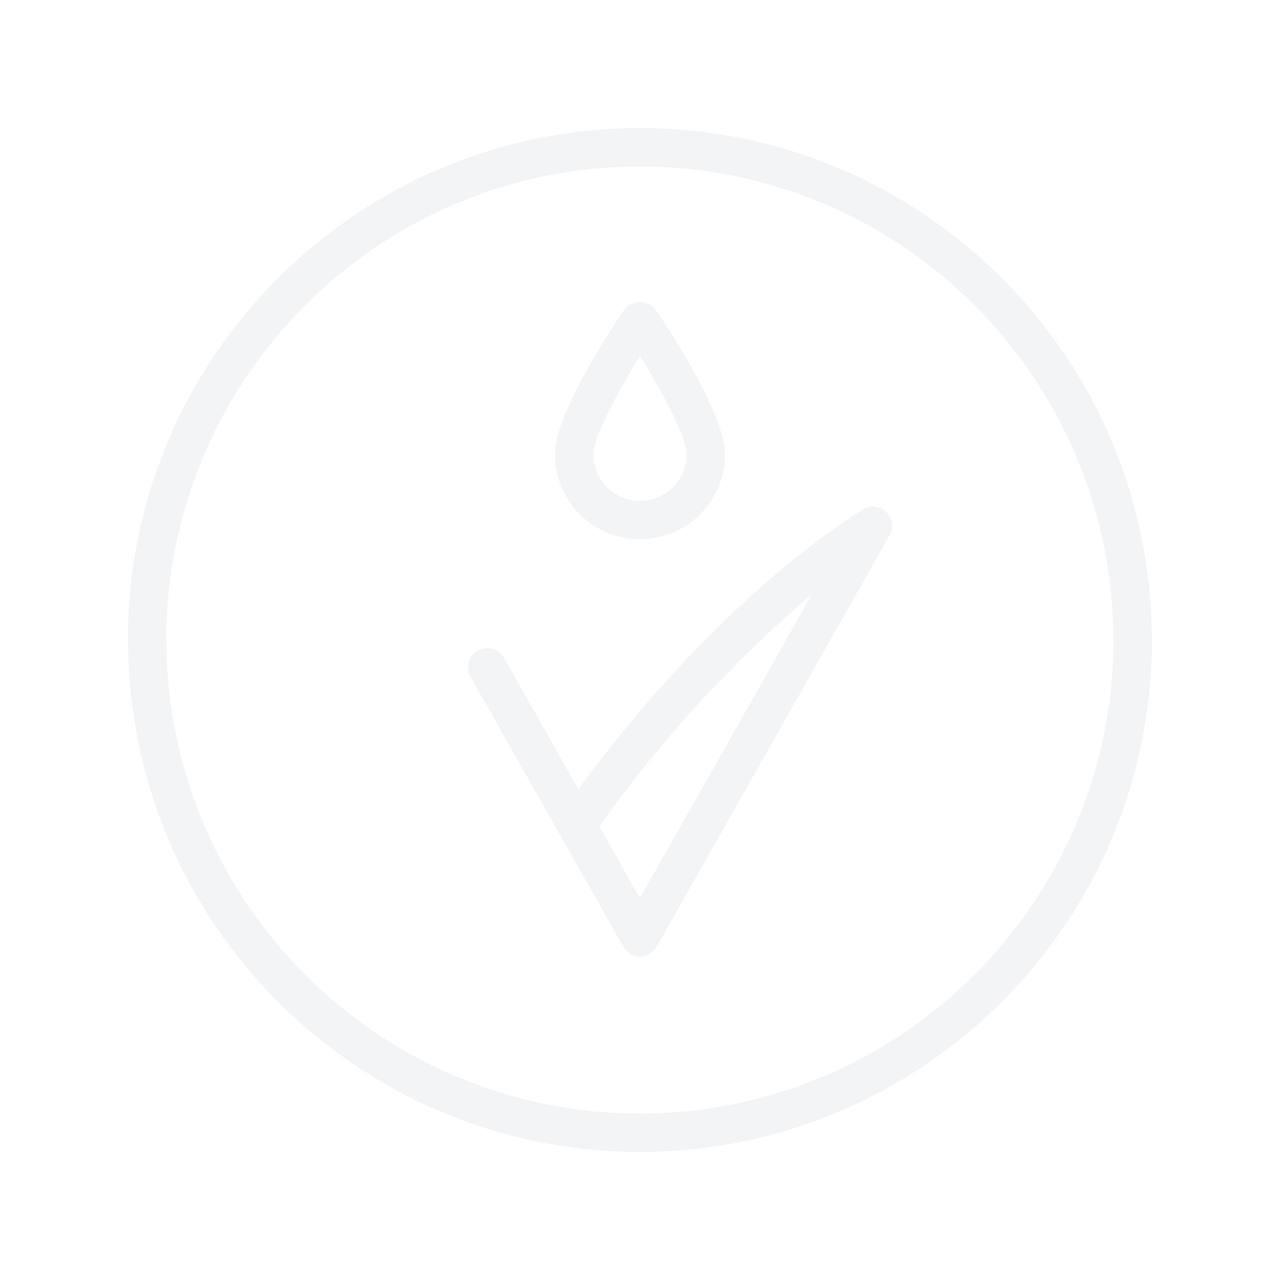 DIOR Diorshow Pump N Volume Mascara No.090 Black Pump тушь для ресниц 6g